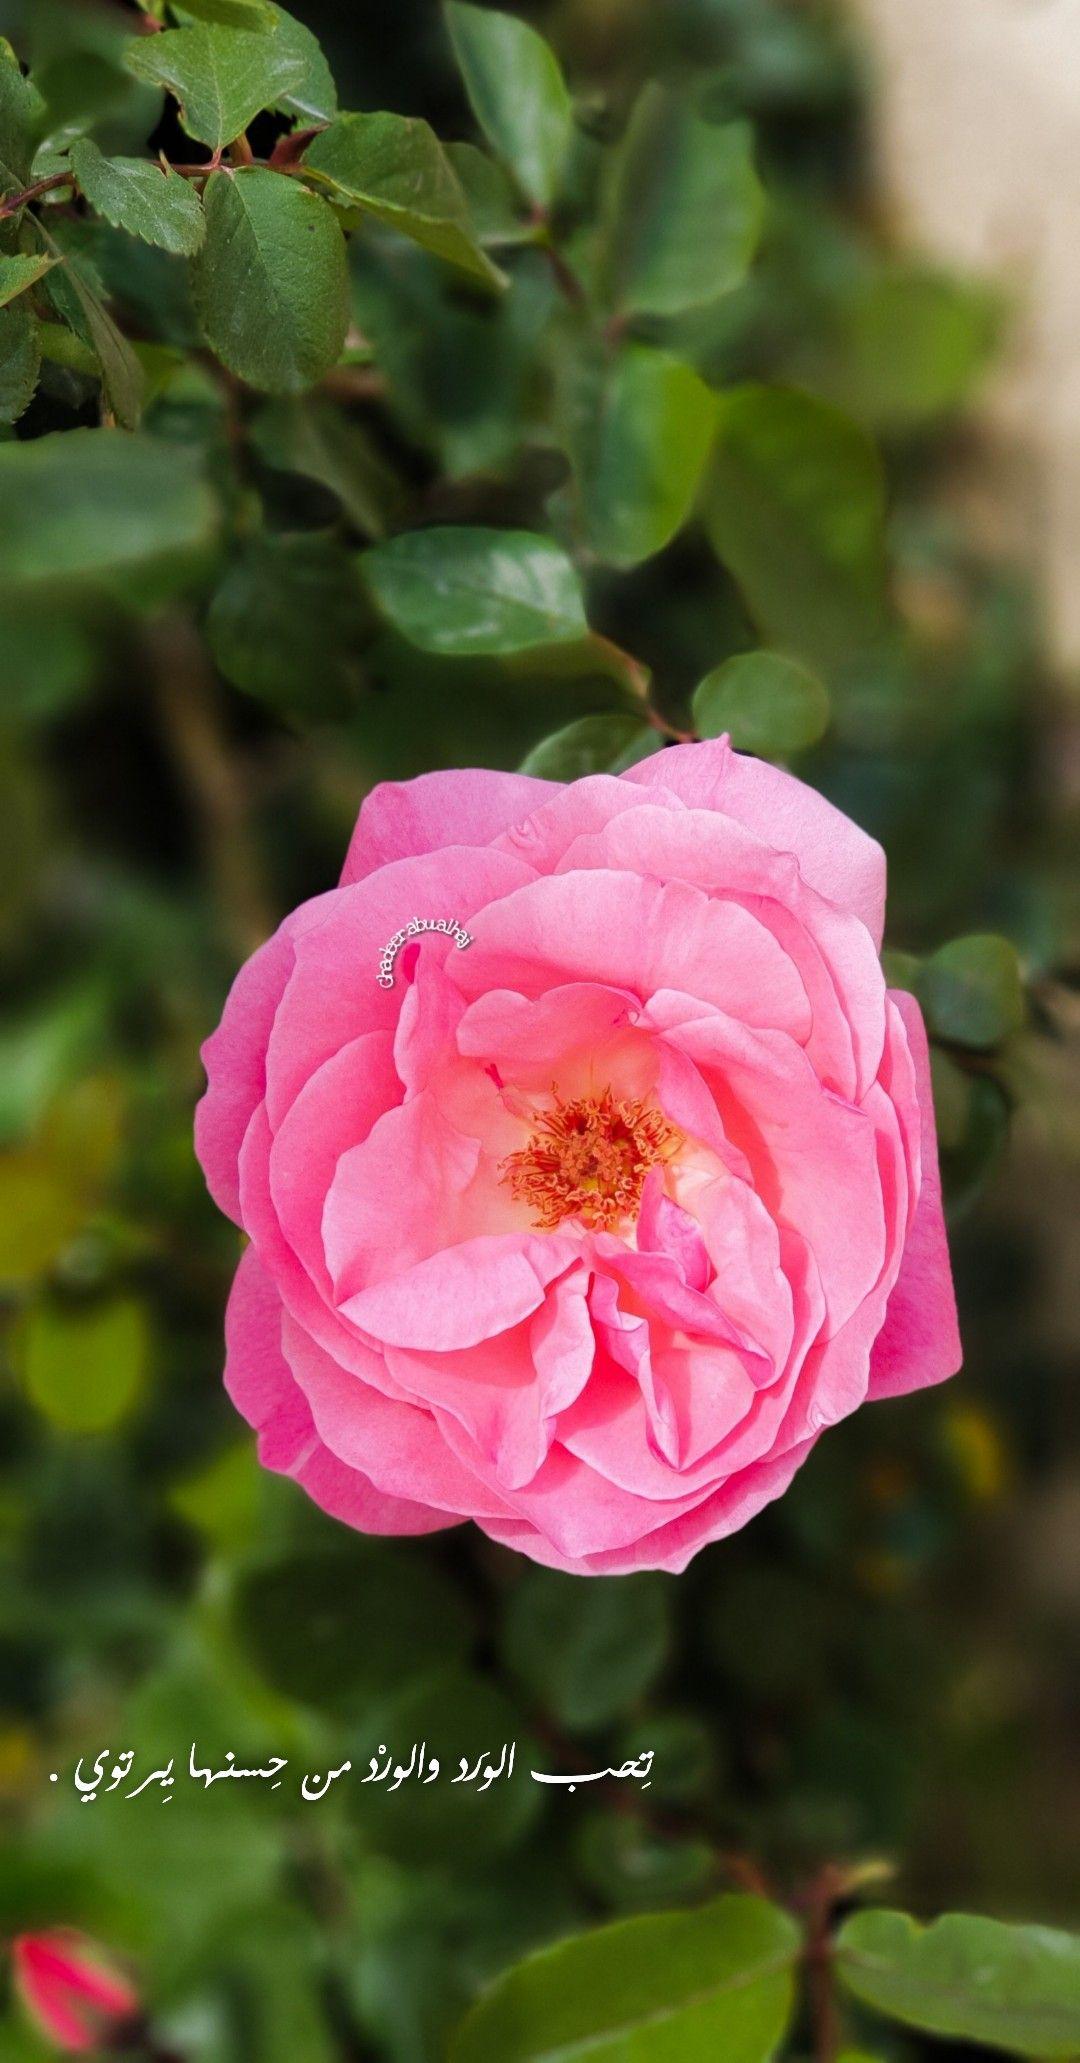 ورد صور صور ورد جمال زهر اقتباسات صور مصورات تصويري Flower Pink Sky Photography Nature Sky Photography Flower Box Gift